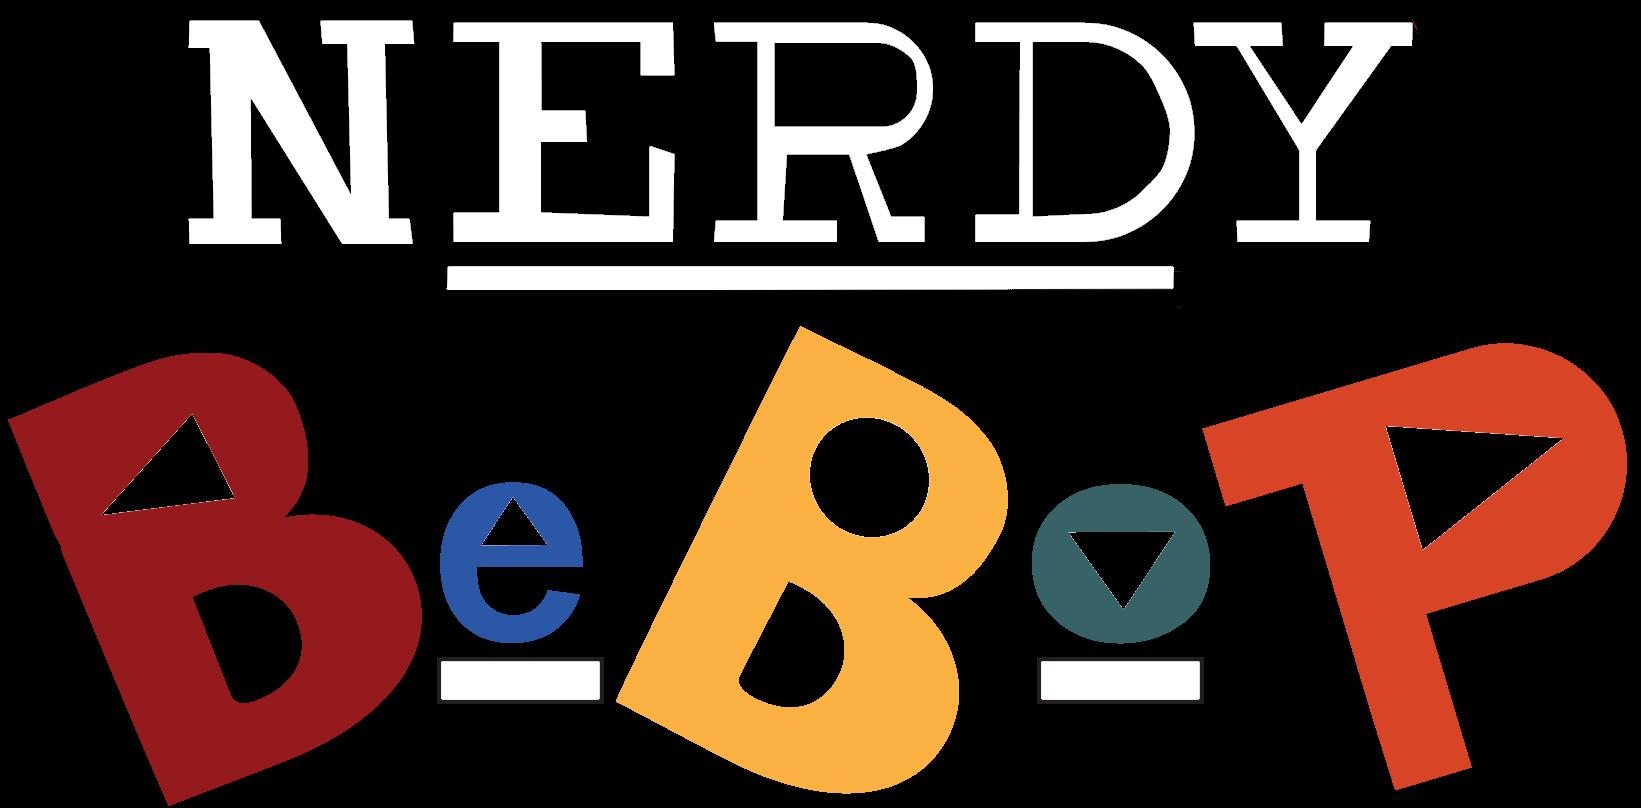 NerdyBebop